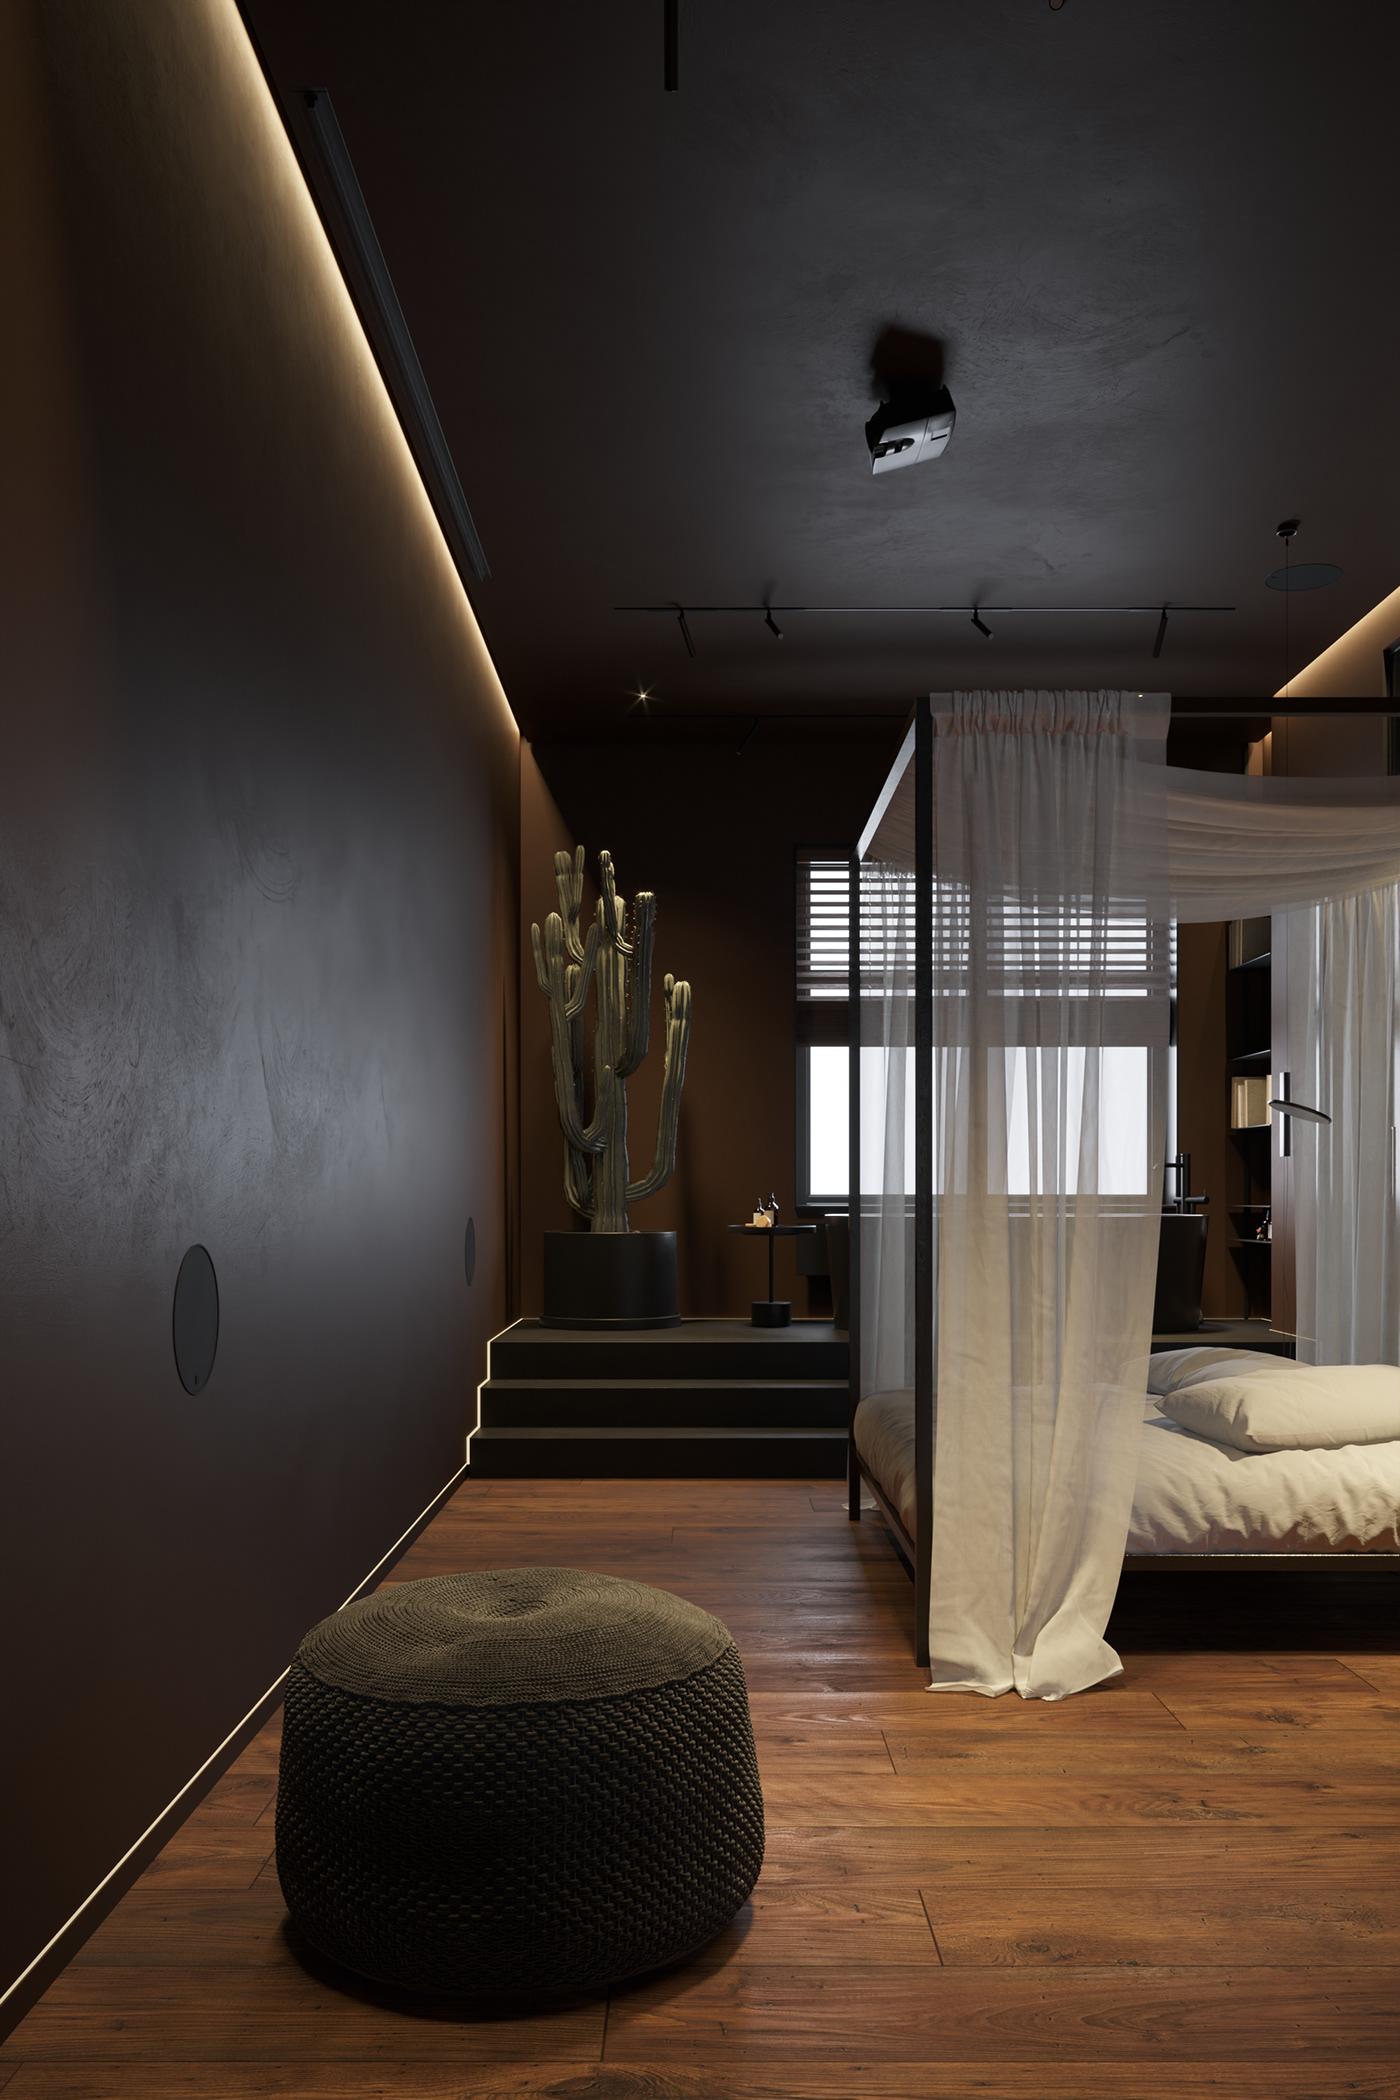 bathroom bedroom brown interior DUBAI INTERIOR interior design  kiev interior kitchen living room warm minimalist